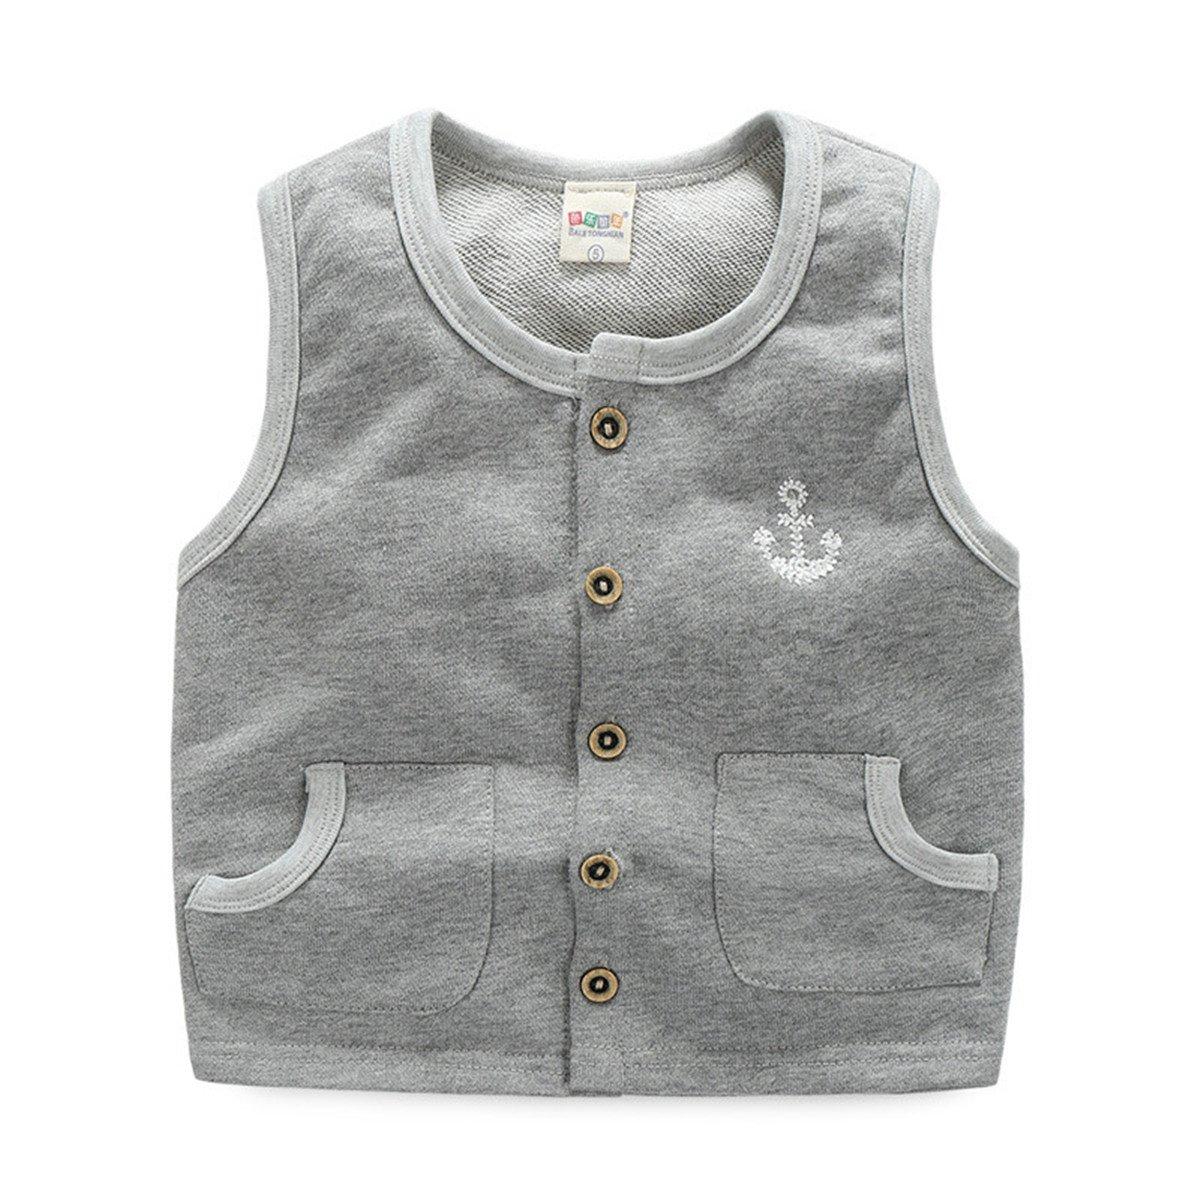 Toddler Unisex Infant Kid Boys Girls Anchor Button Winter Fleece Vest Waistcoat bhnvytvo61